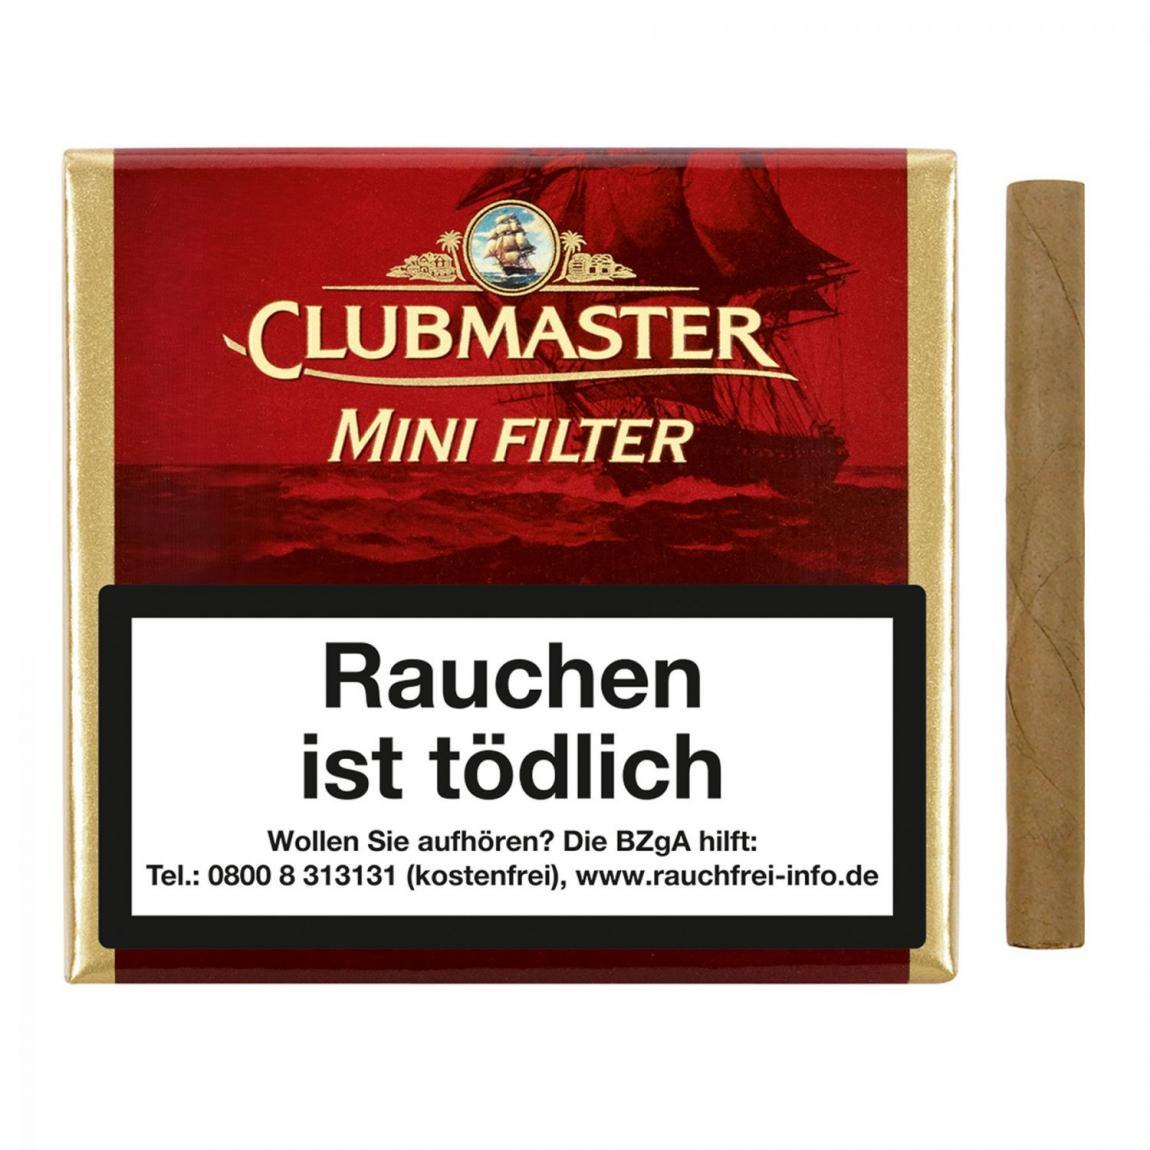 Clubmaster Mini Filter Red No. 222, 20er Kartonbox